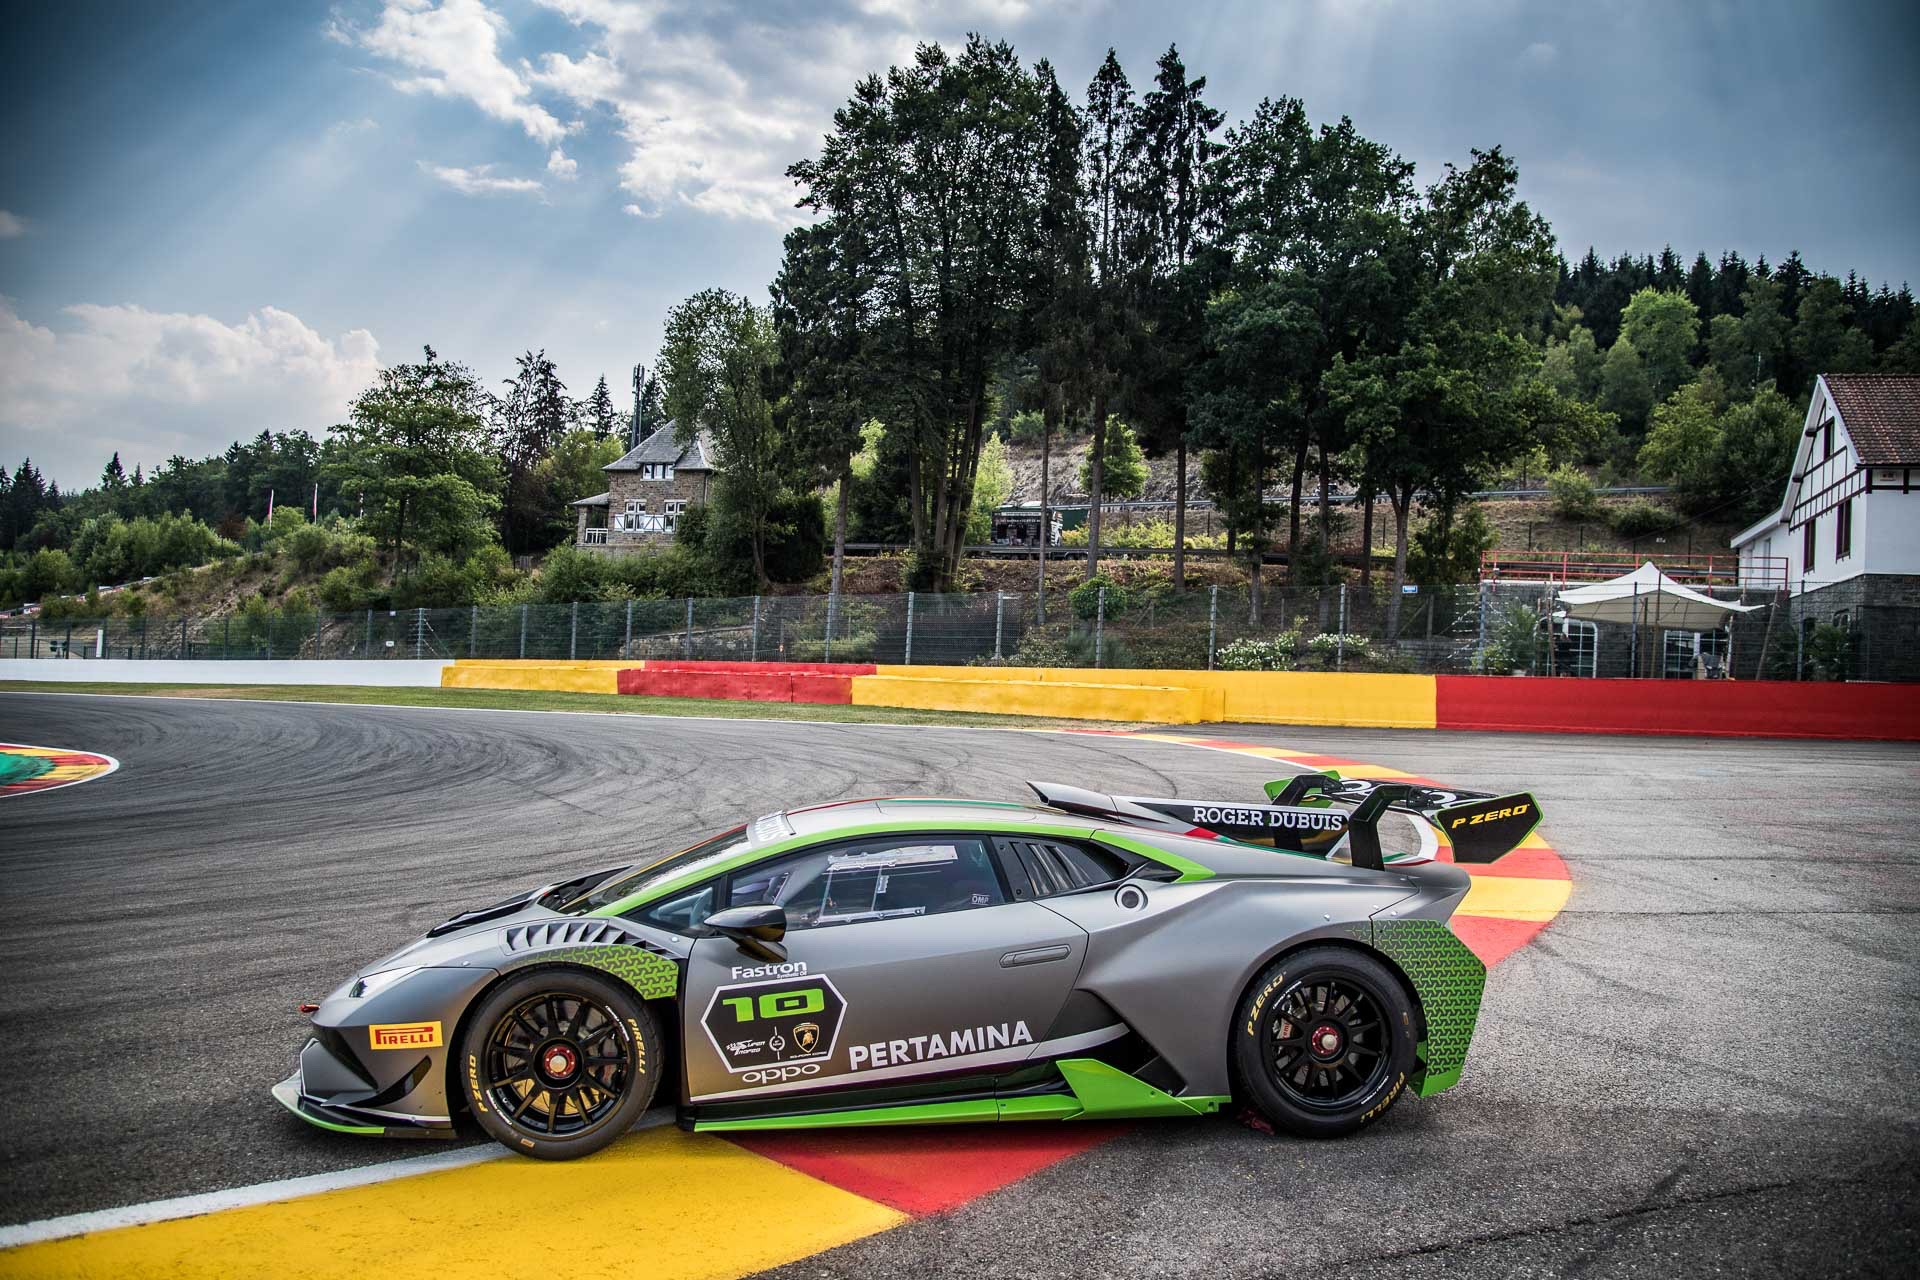 Lamborghini_Huracan_Super_Trofeo_Evo_10th_Edition_0005